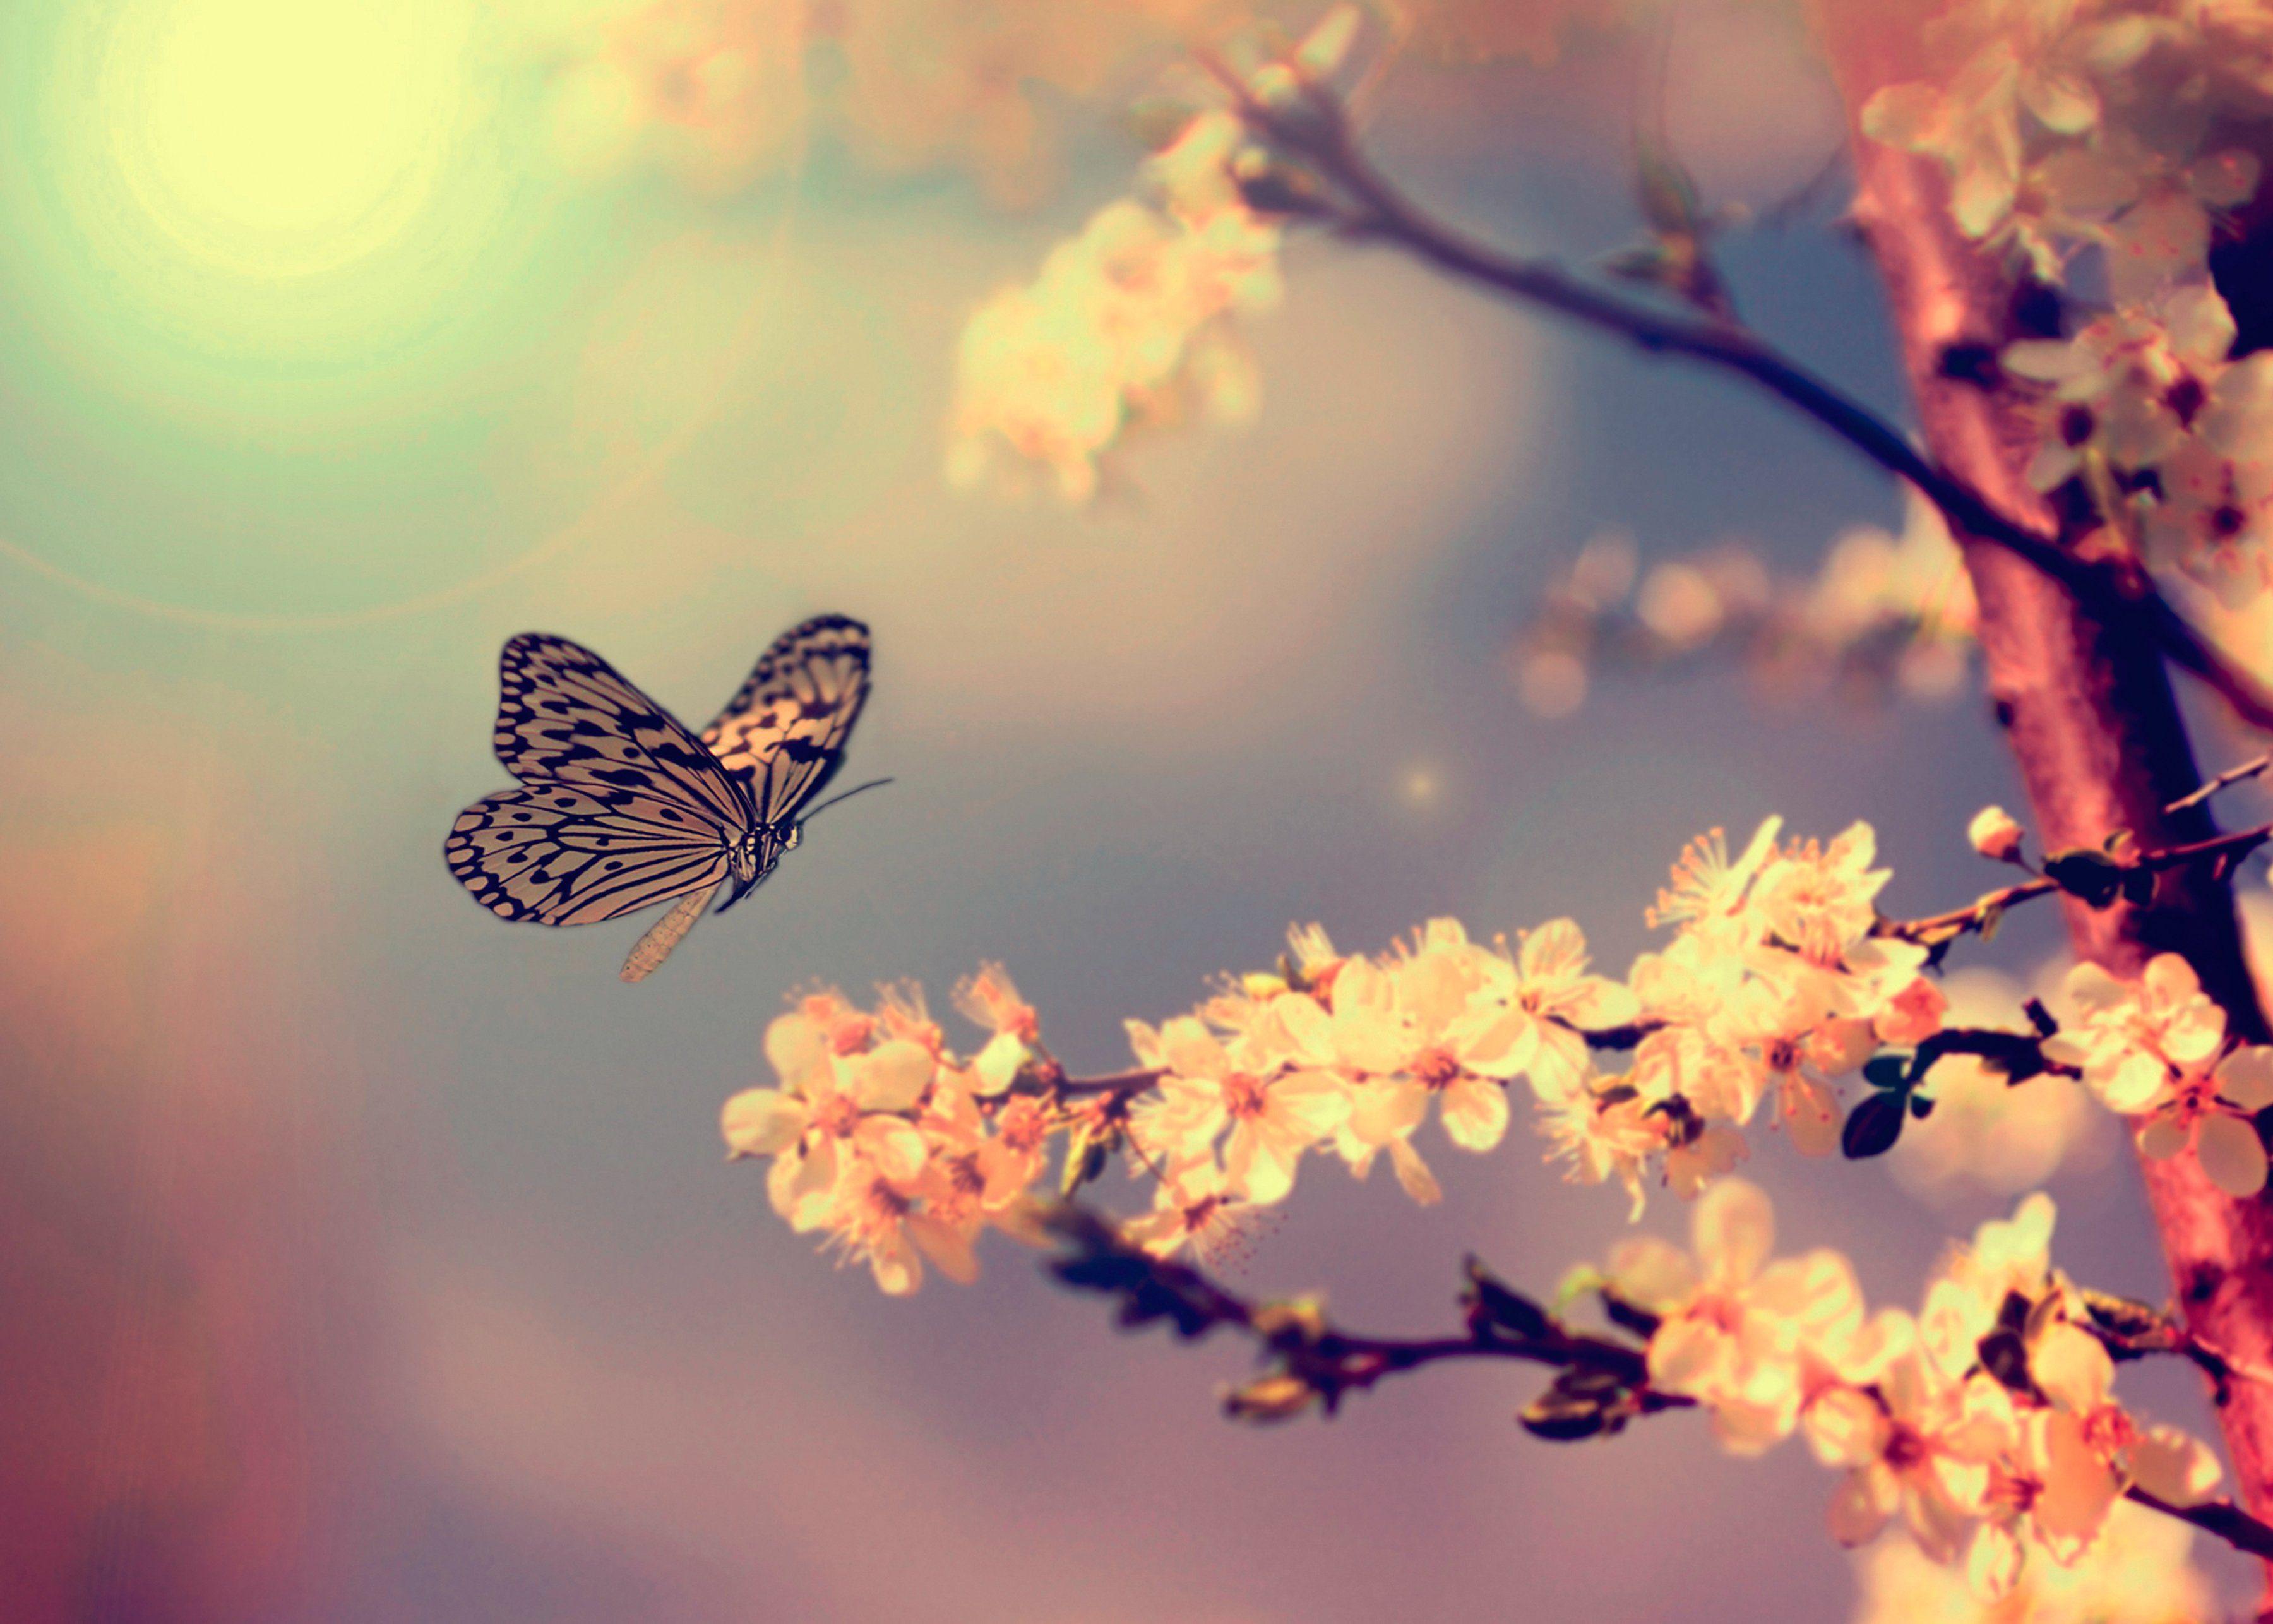 Leinwandbild »Frühlingsmoment«